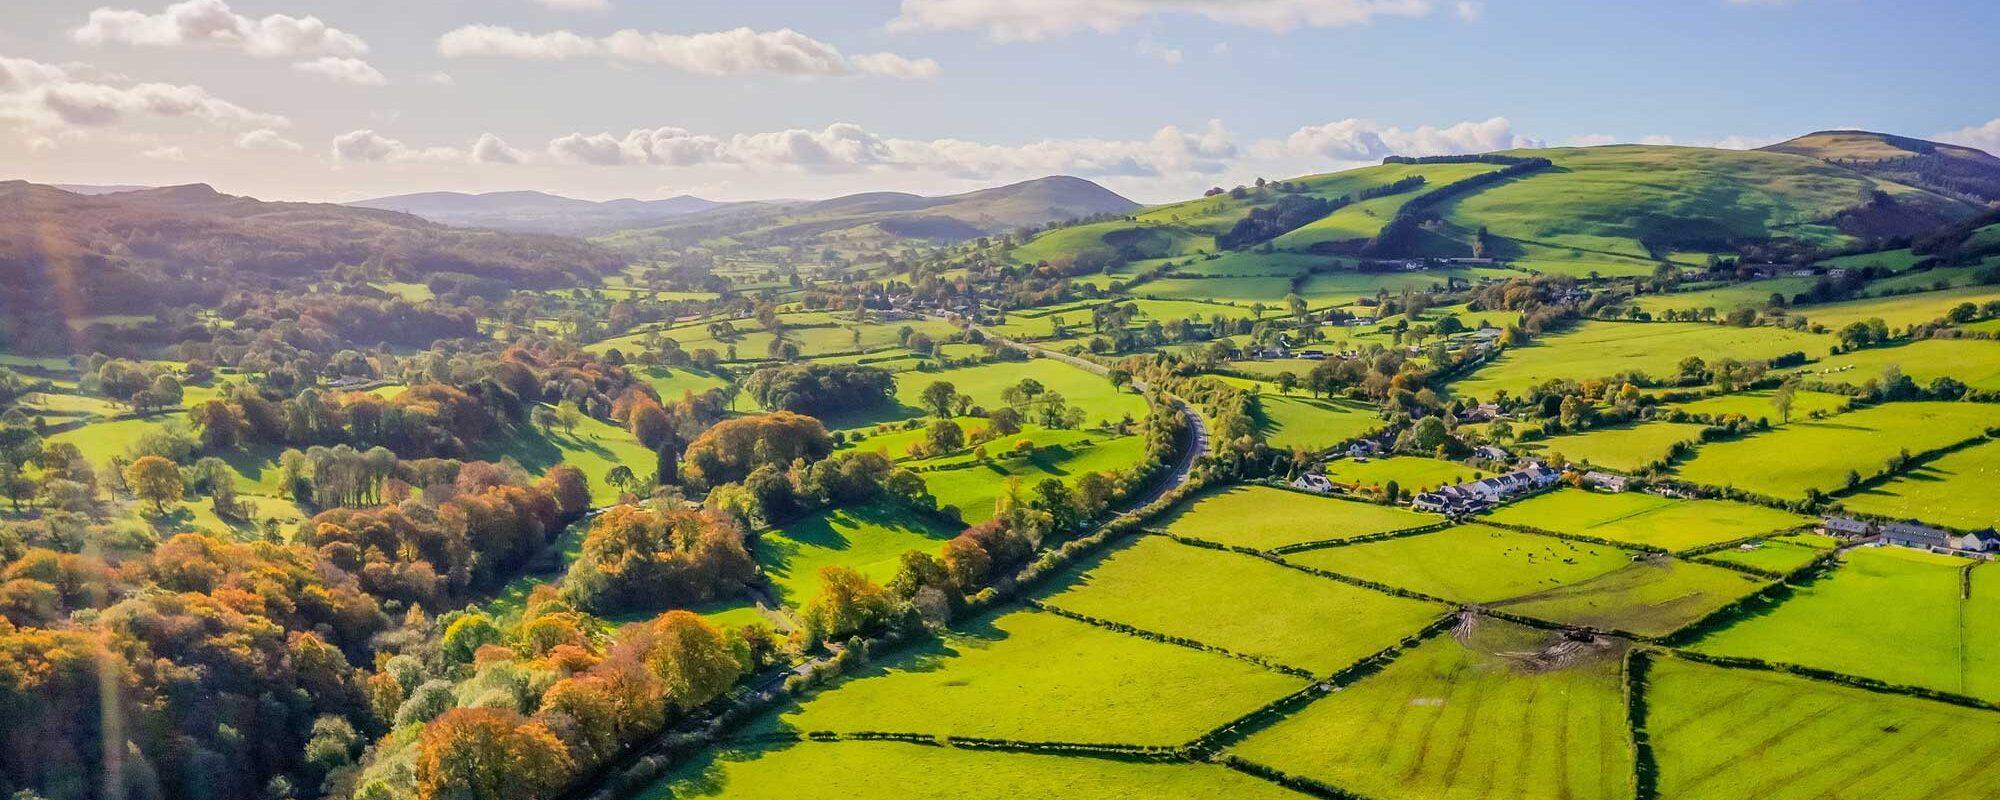 Denbighshire launches new tourism resources